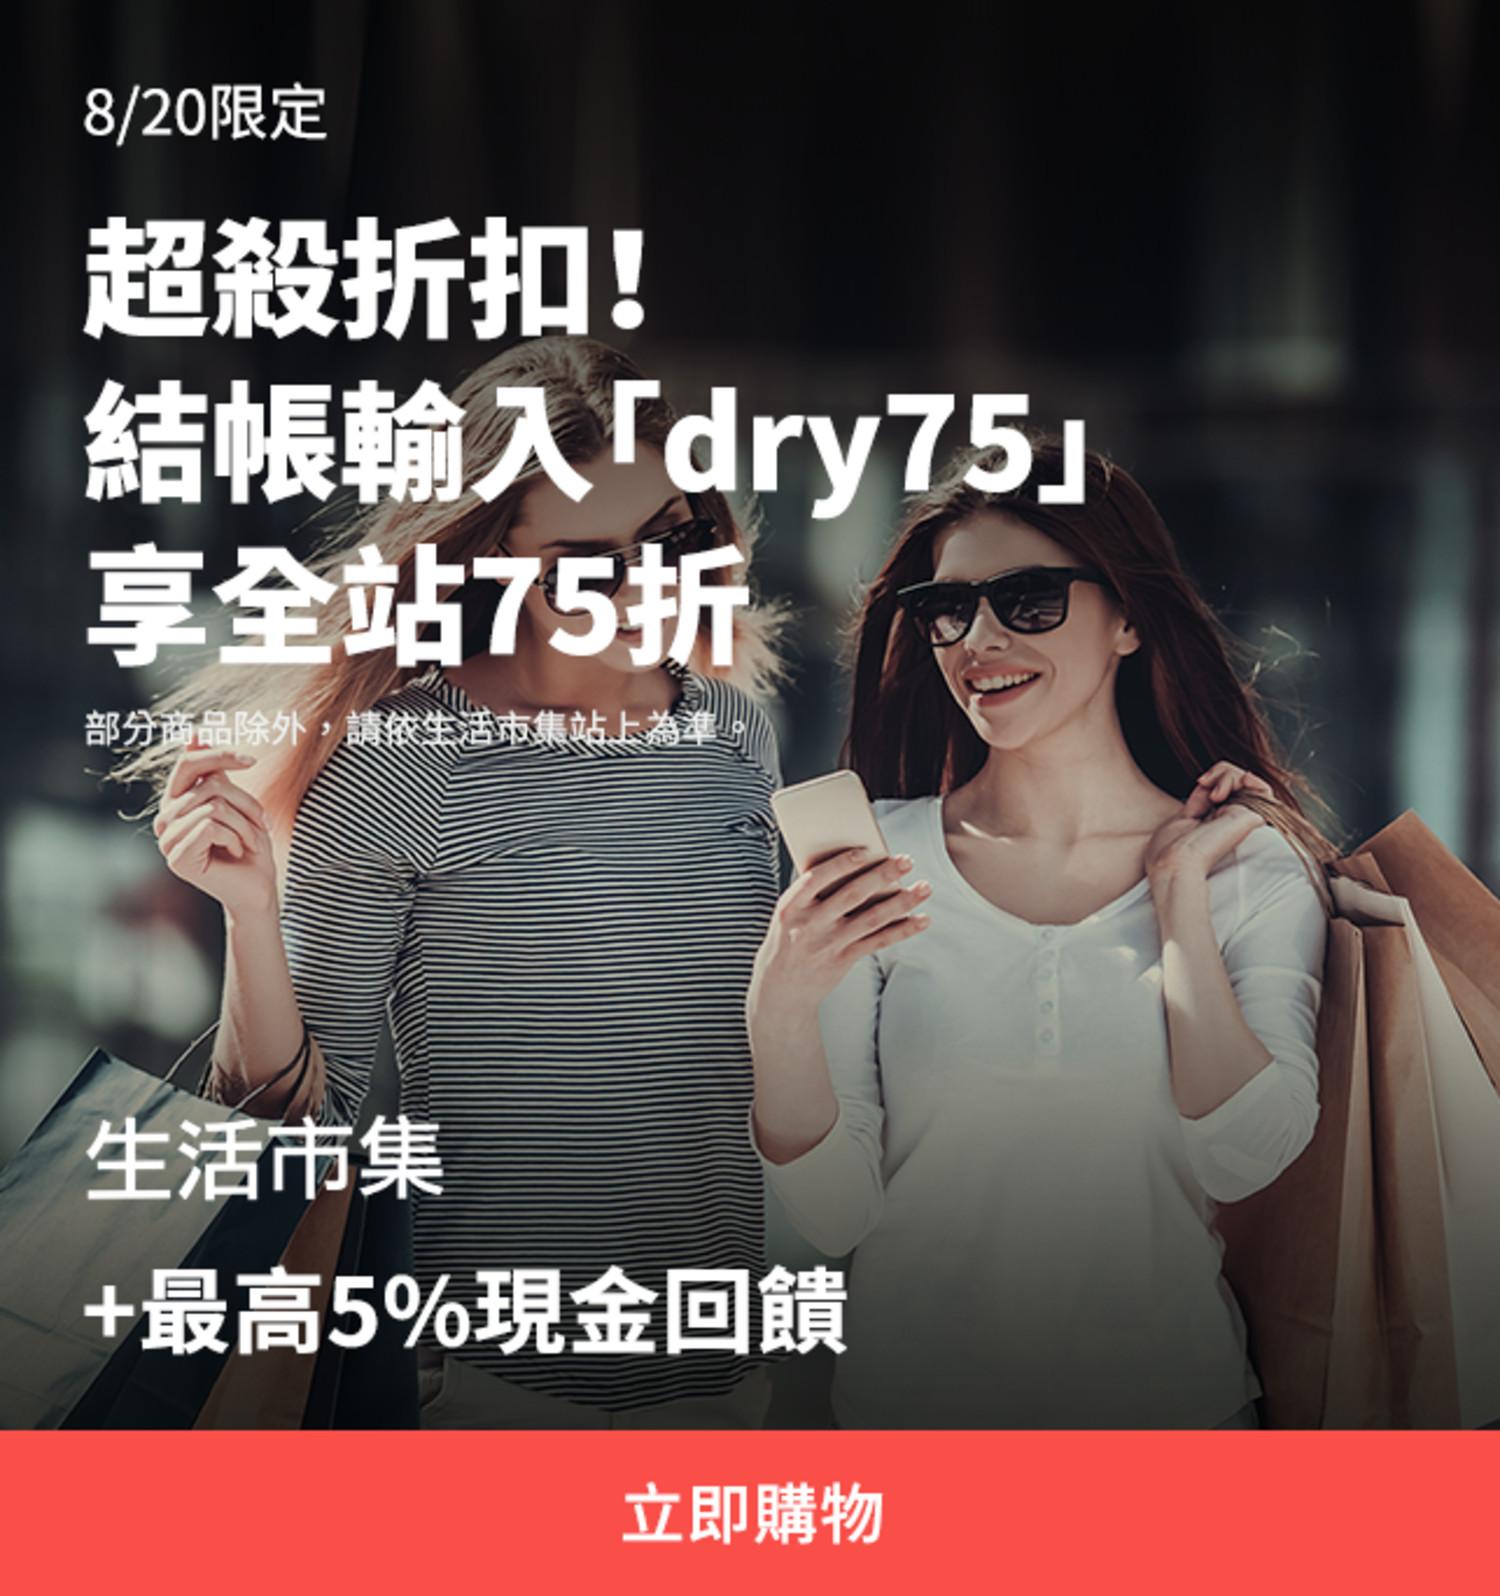 buy123_0820